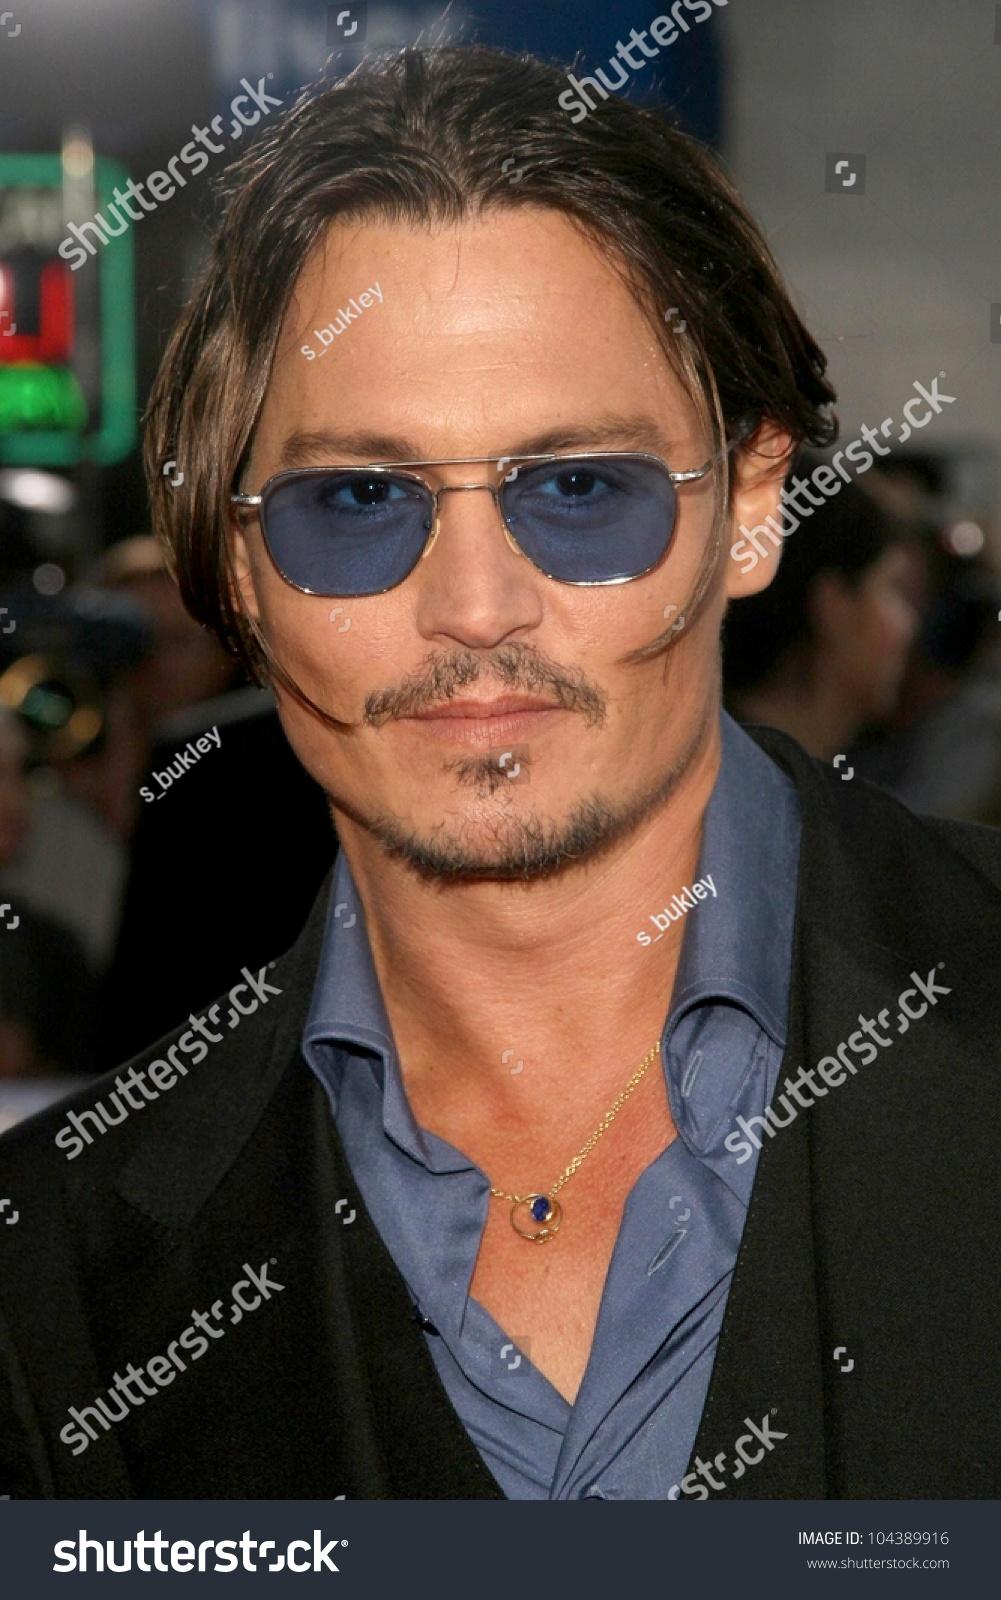 Fabulous Johnny Depp At The Los Angeles Premiere Of 39Public Enemies39 Mann Short Hairstyles For Black Women Fulllsitofus